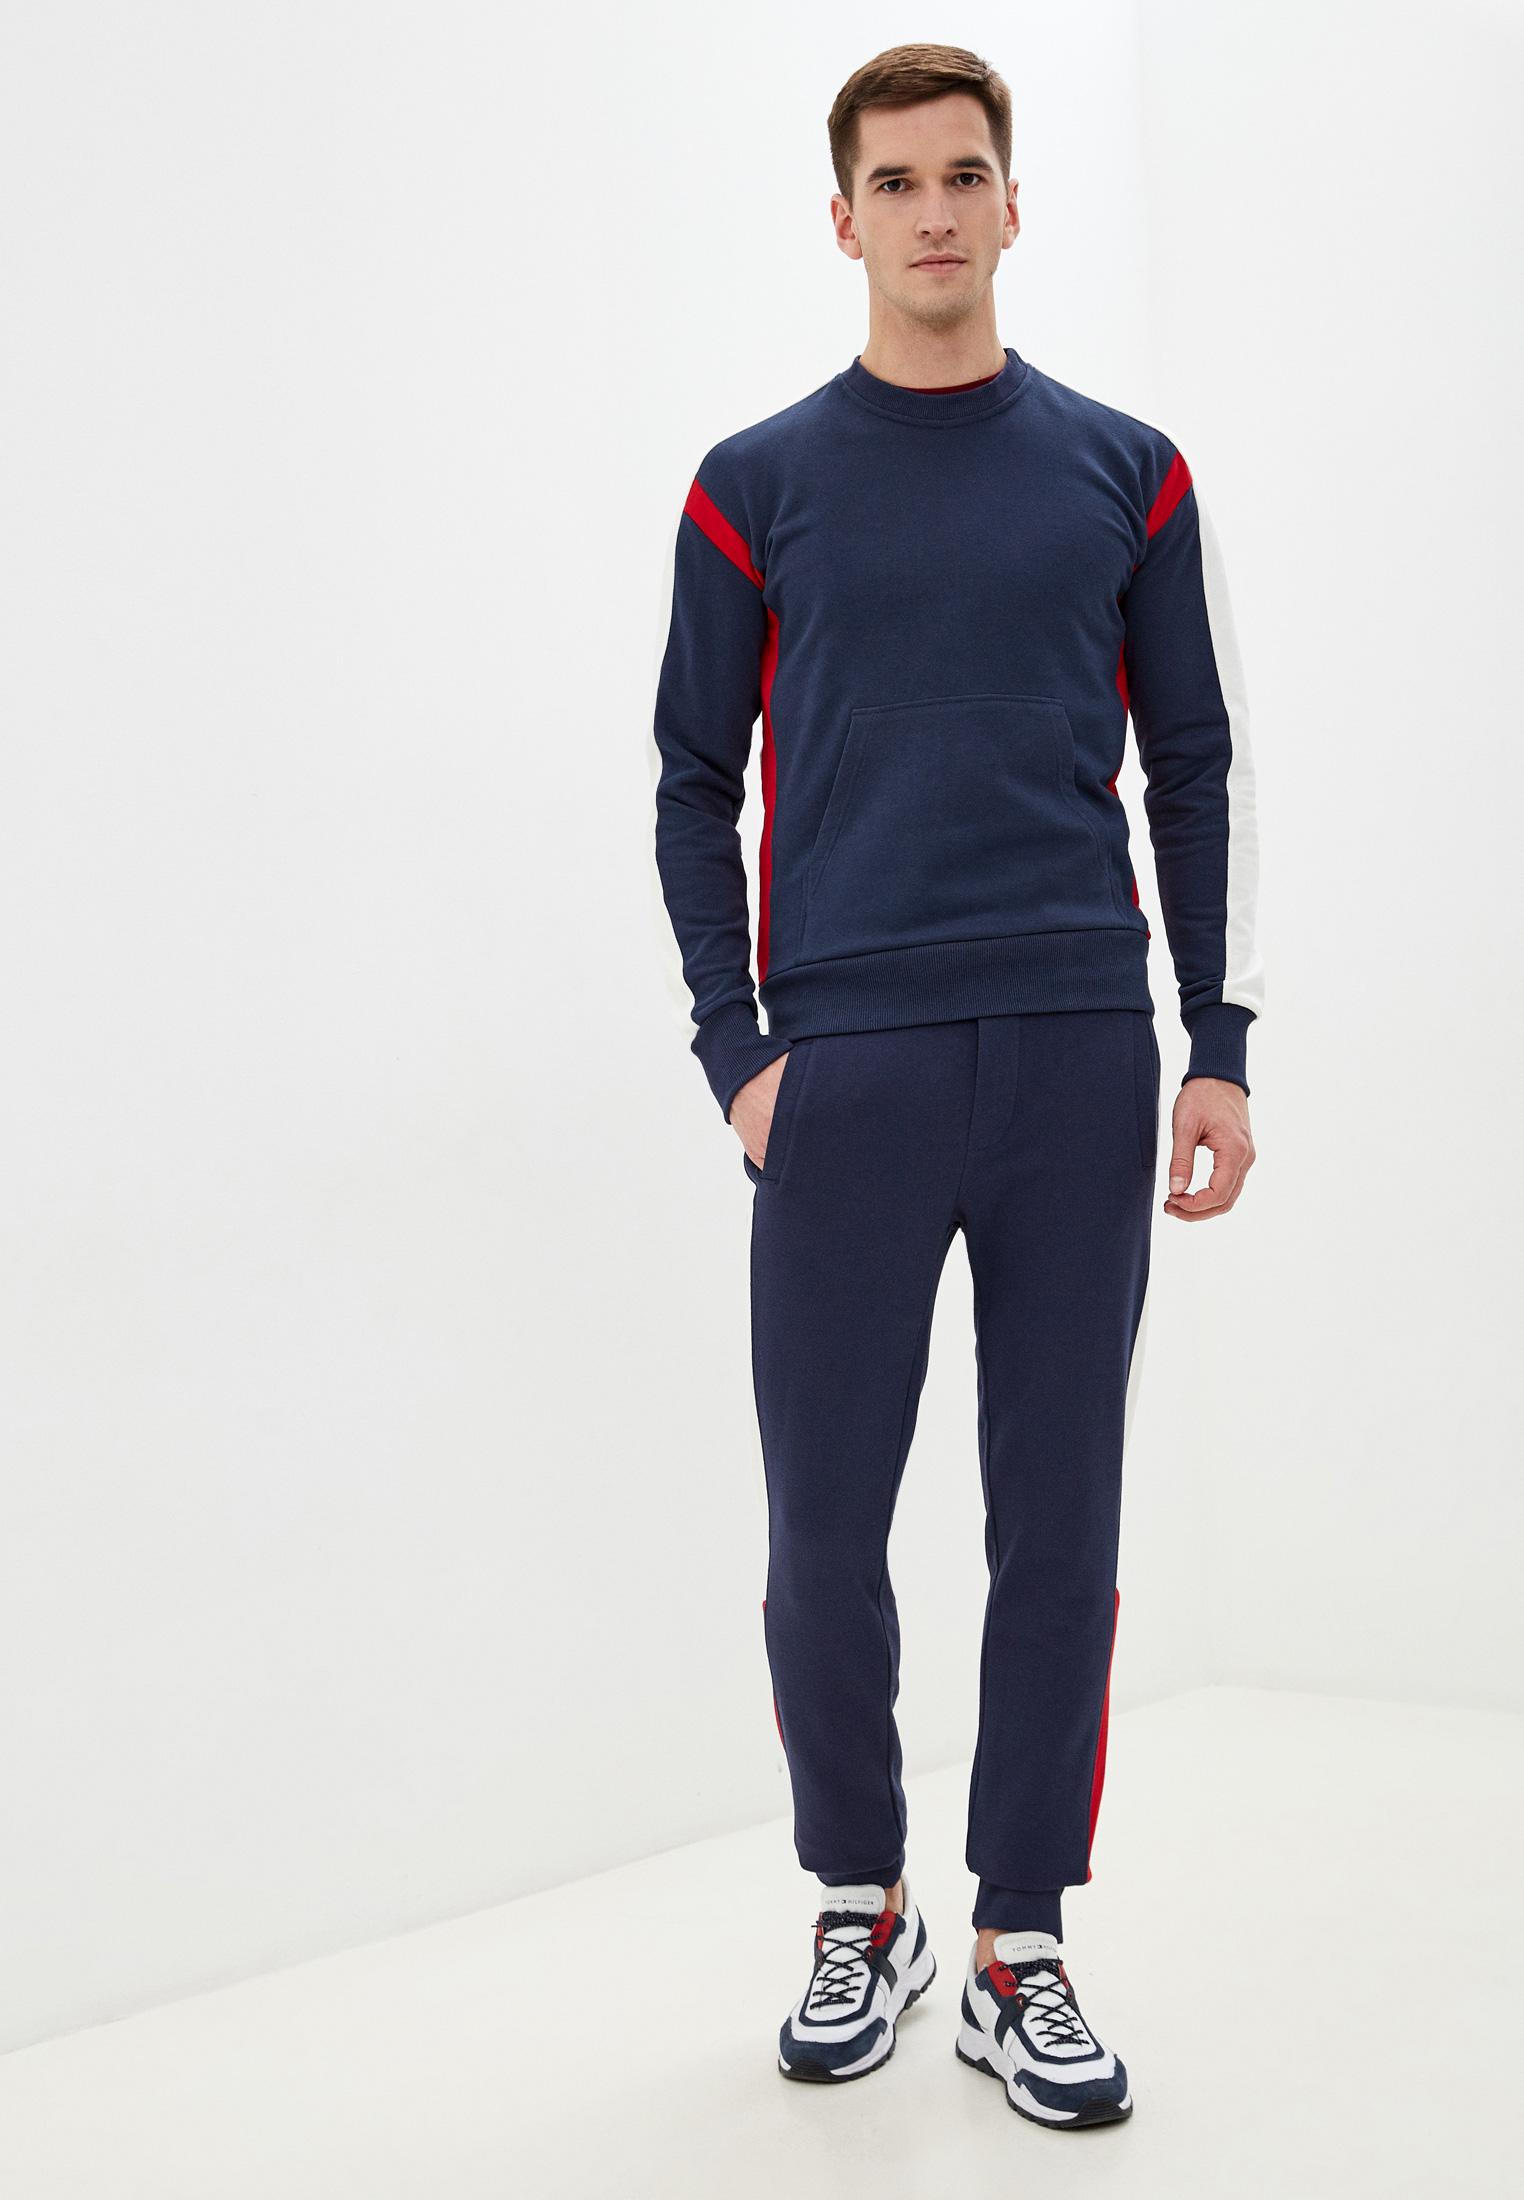 Спортивный костюм Sitlly 20803